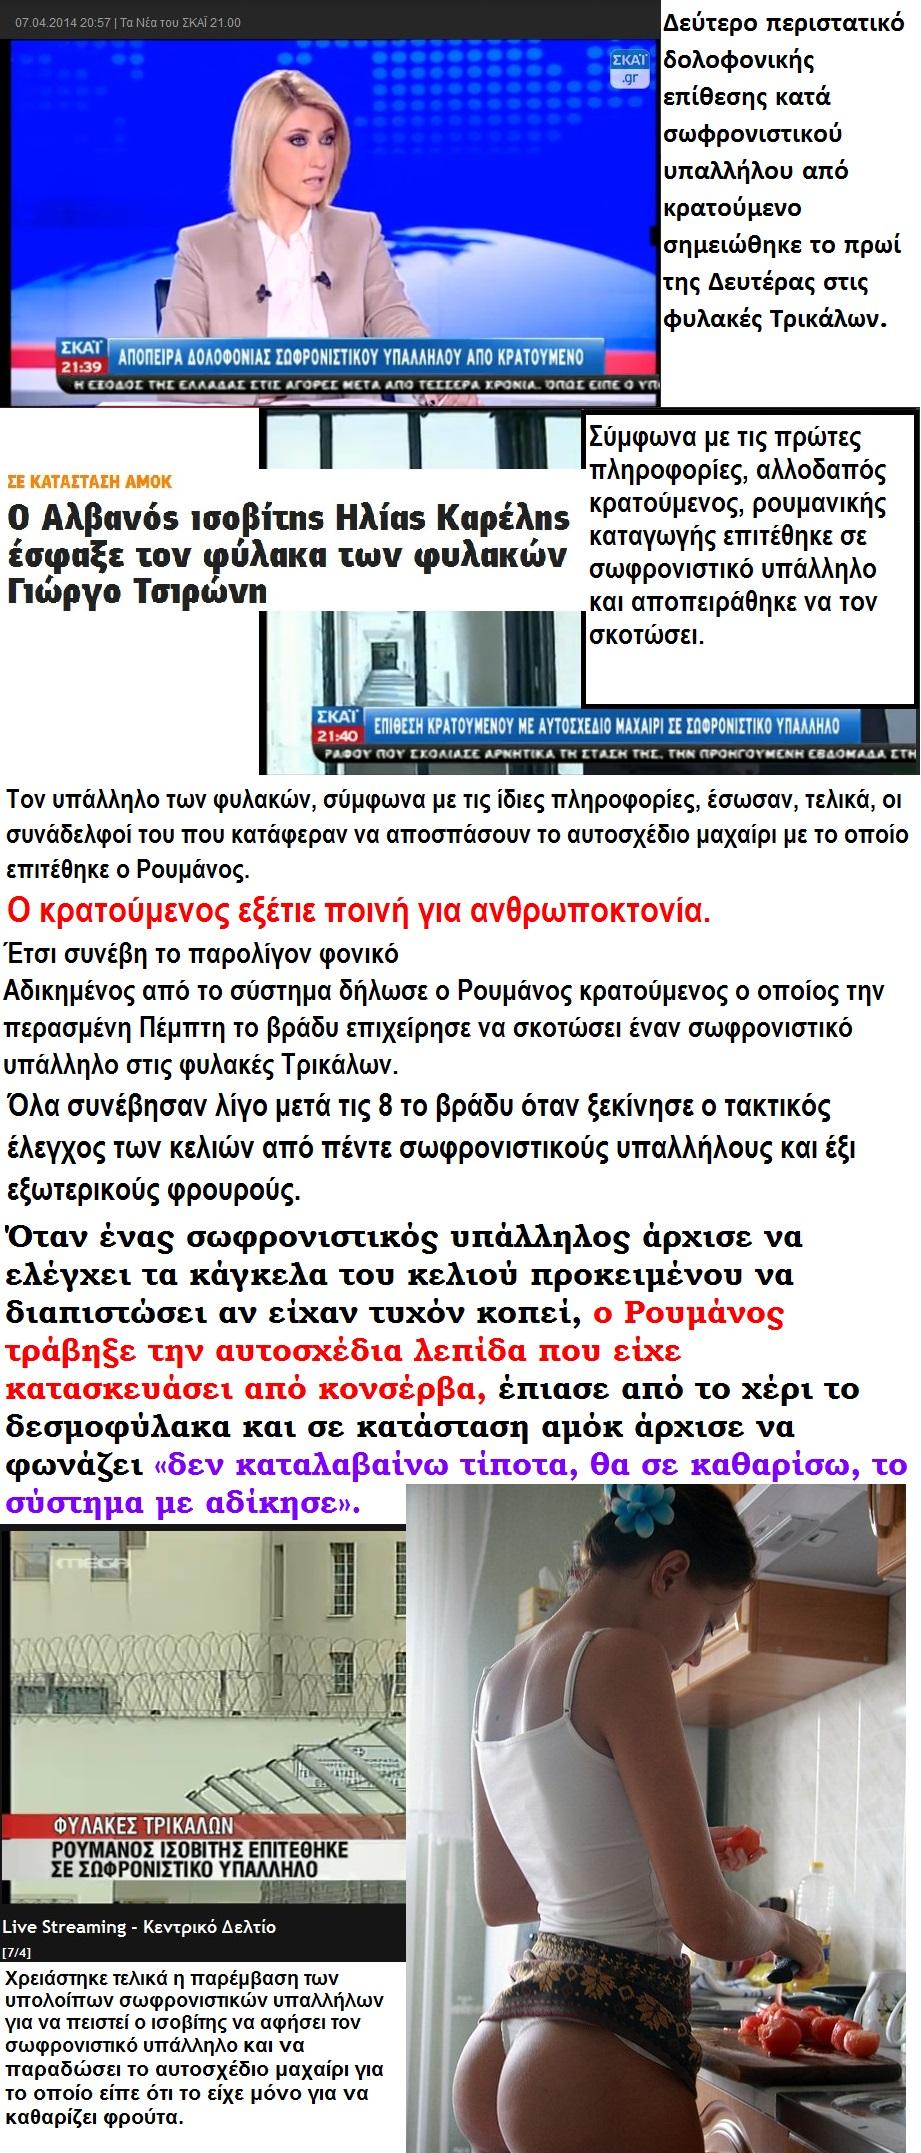 ELLADA FYLAKES ISOBITHS ESFAKSE ARXIFILAKA ROUMANOS 02 090414